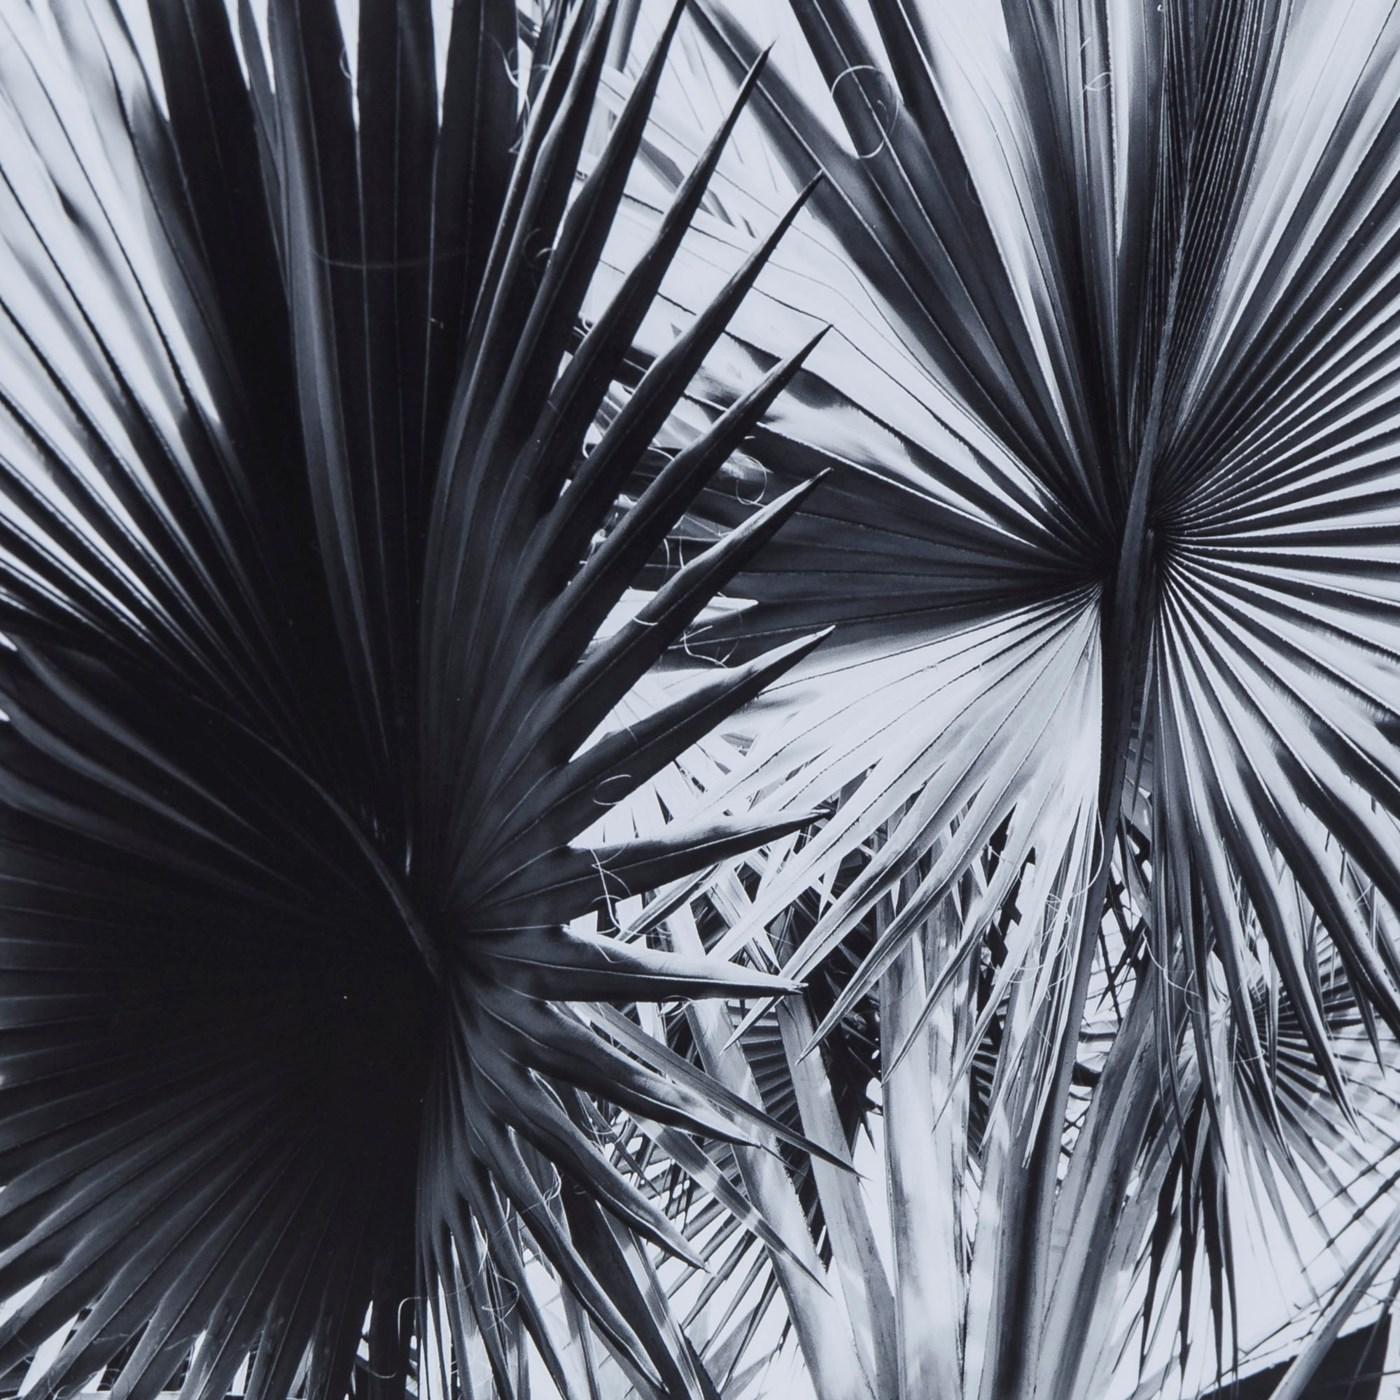 Black & White Palm Leaves - A